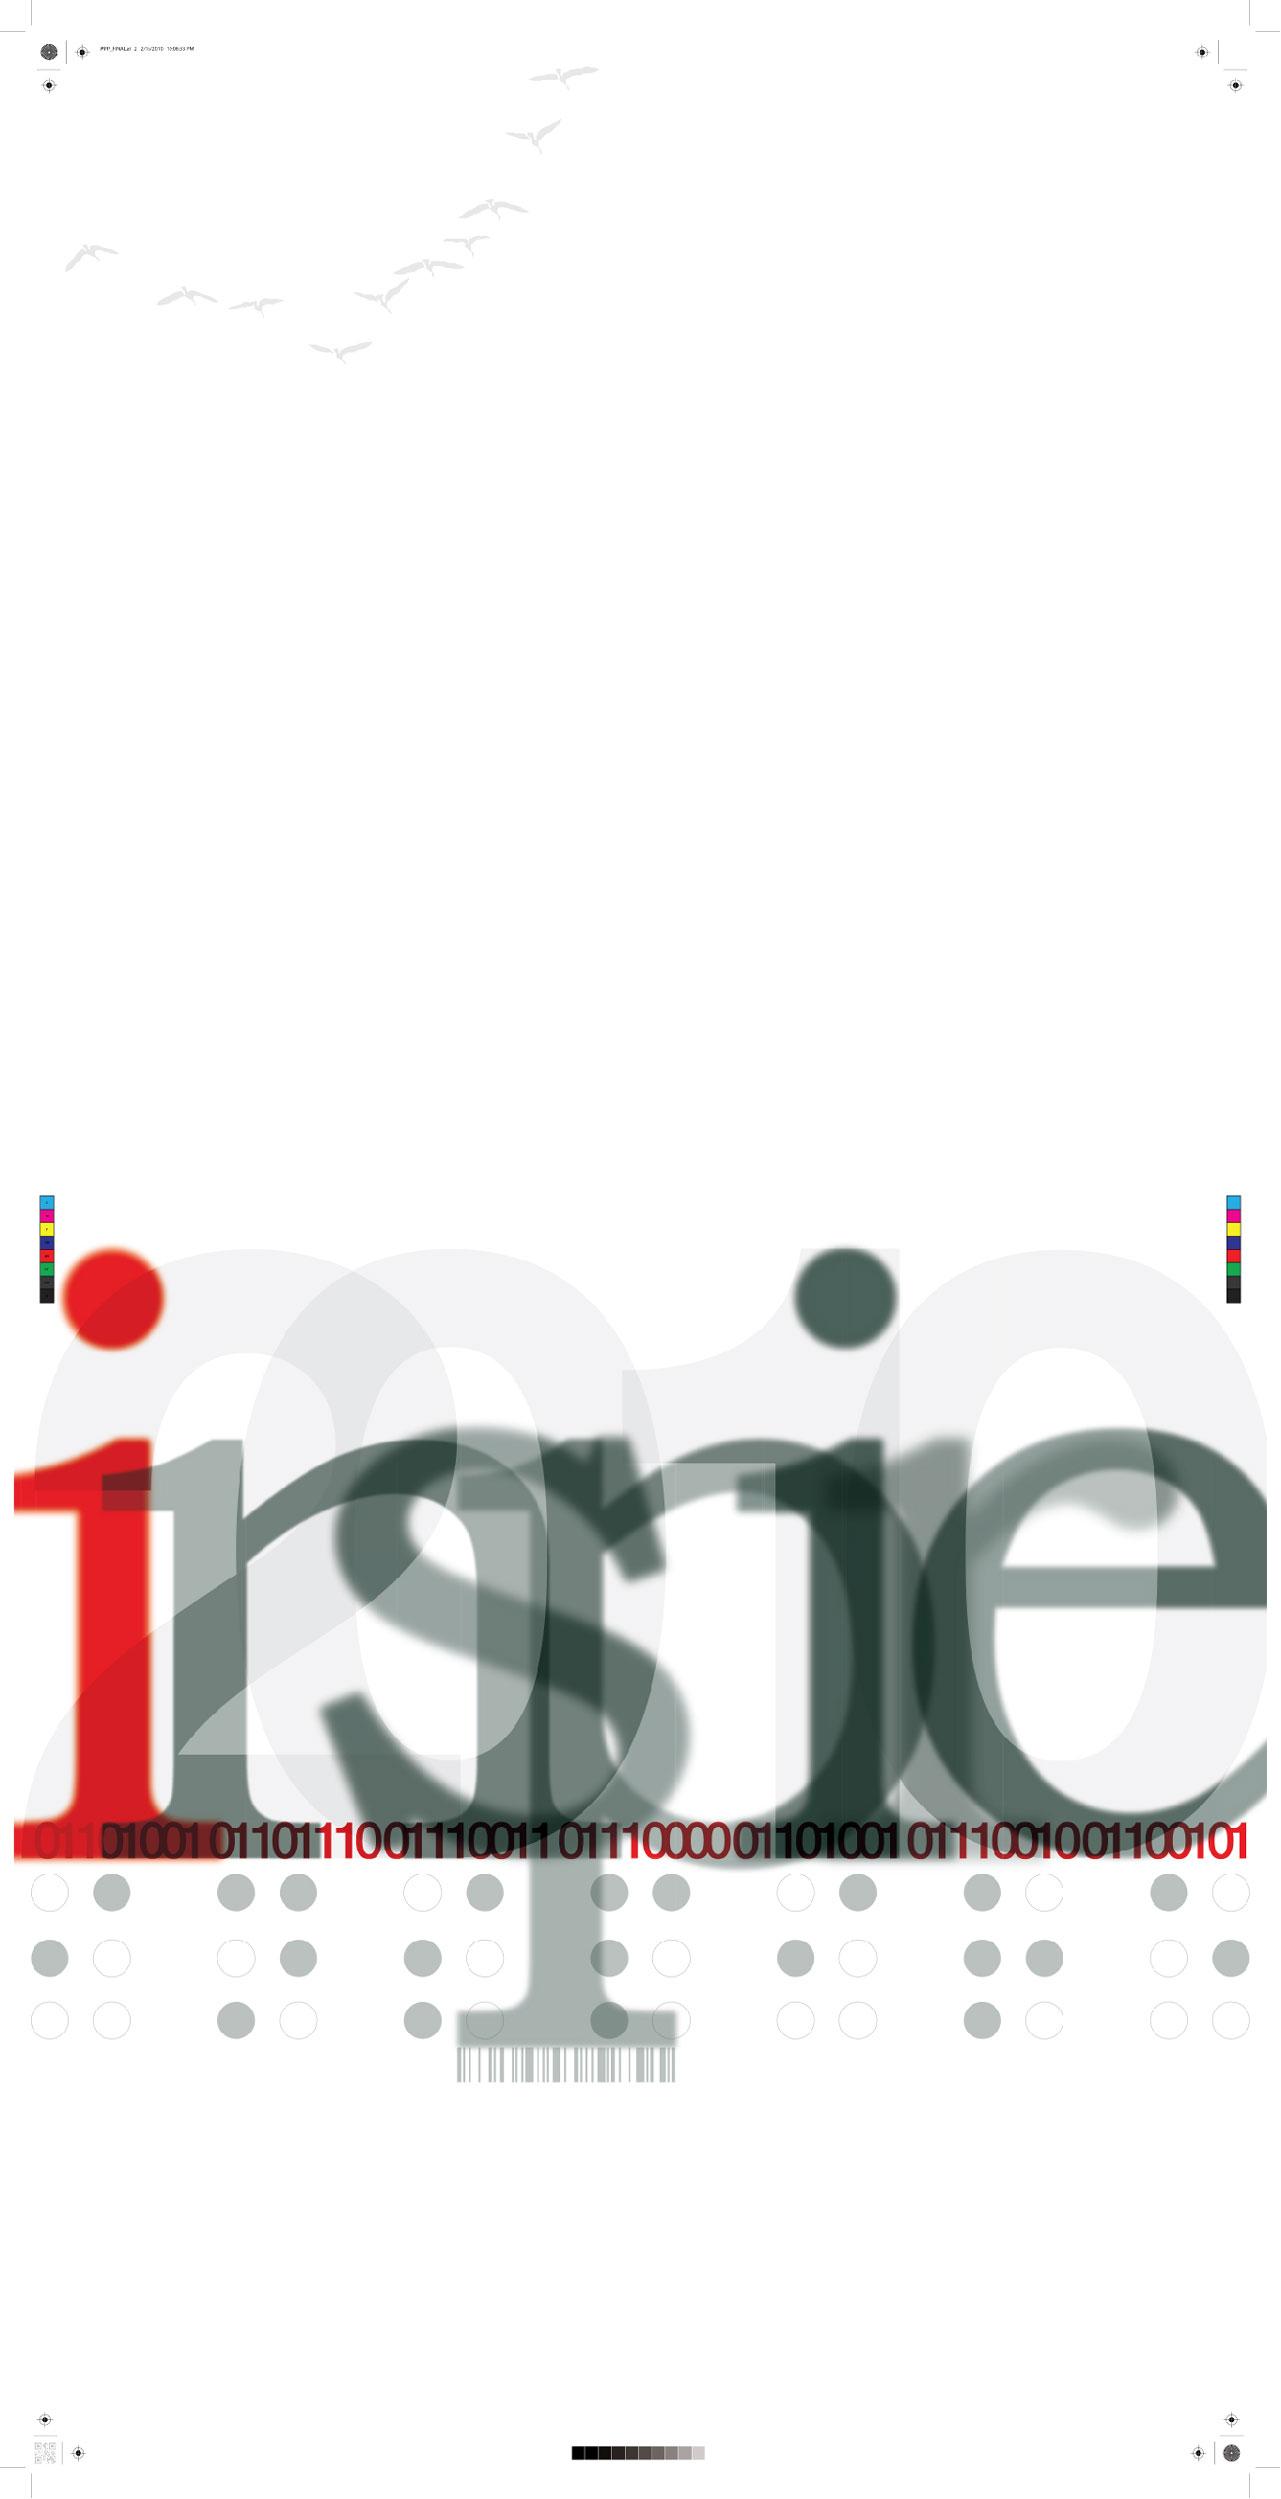 graphic-design-03.jpg